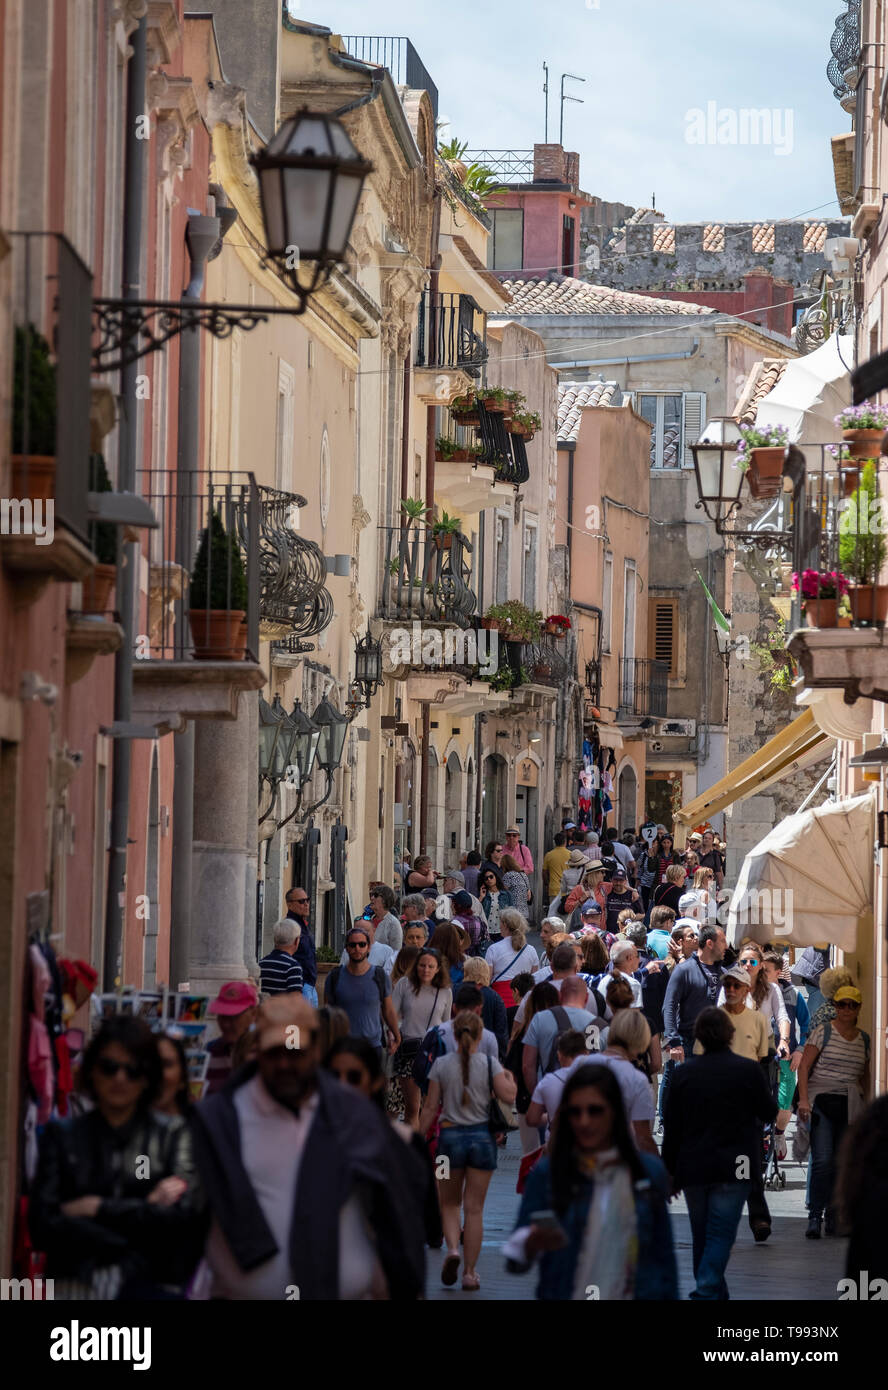 Corso Umberto pedestrian precinct, Taormina, Sicily. - Stock Image